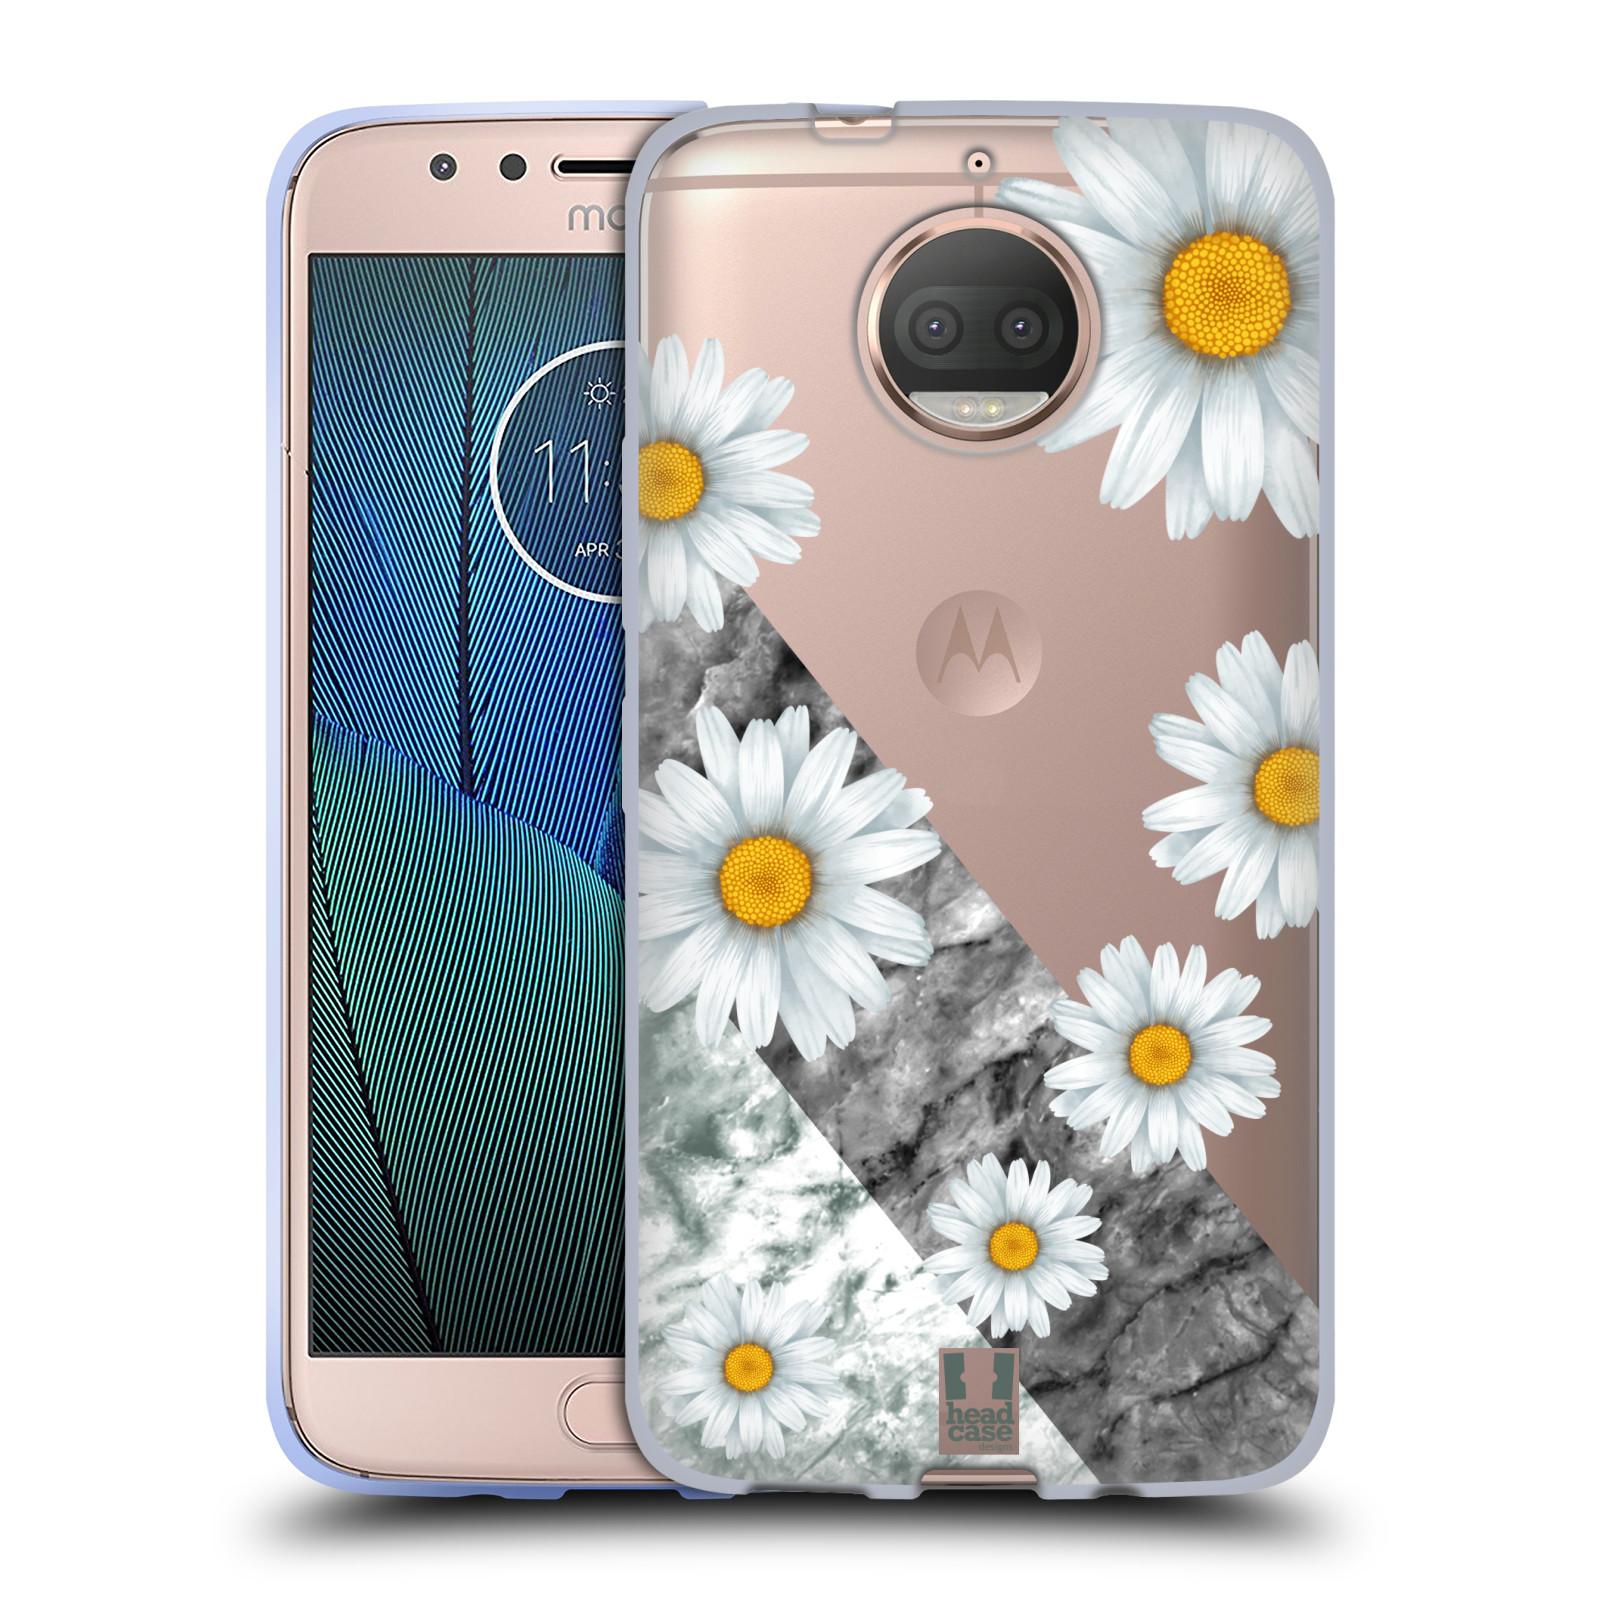 HEAD CASE silikonový obal na mobil Lenovo Moto G5s PLUS květina sedmikráska a mramor